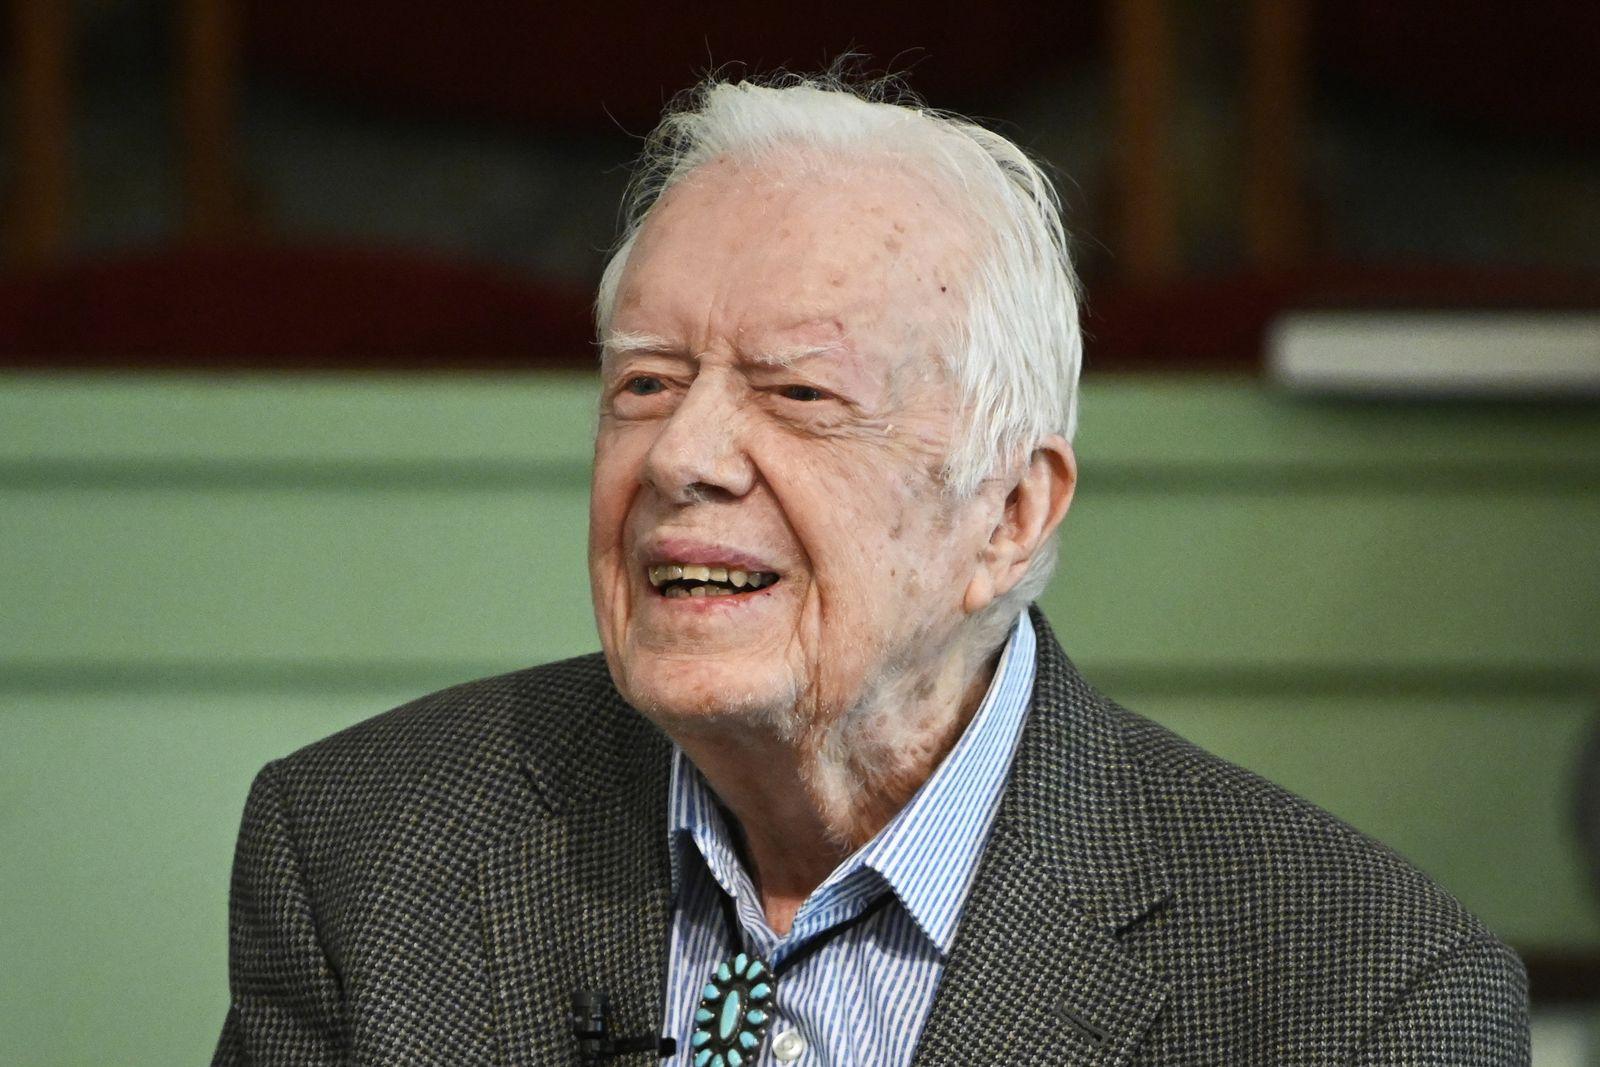 Früherer US-Präsident Carter verlässt Krankenhaus